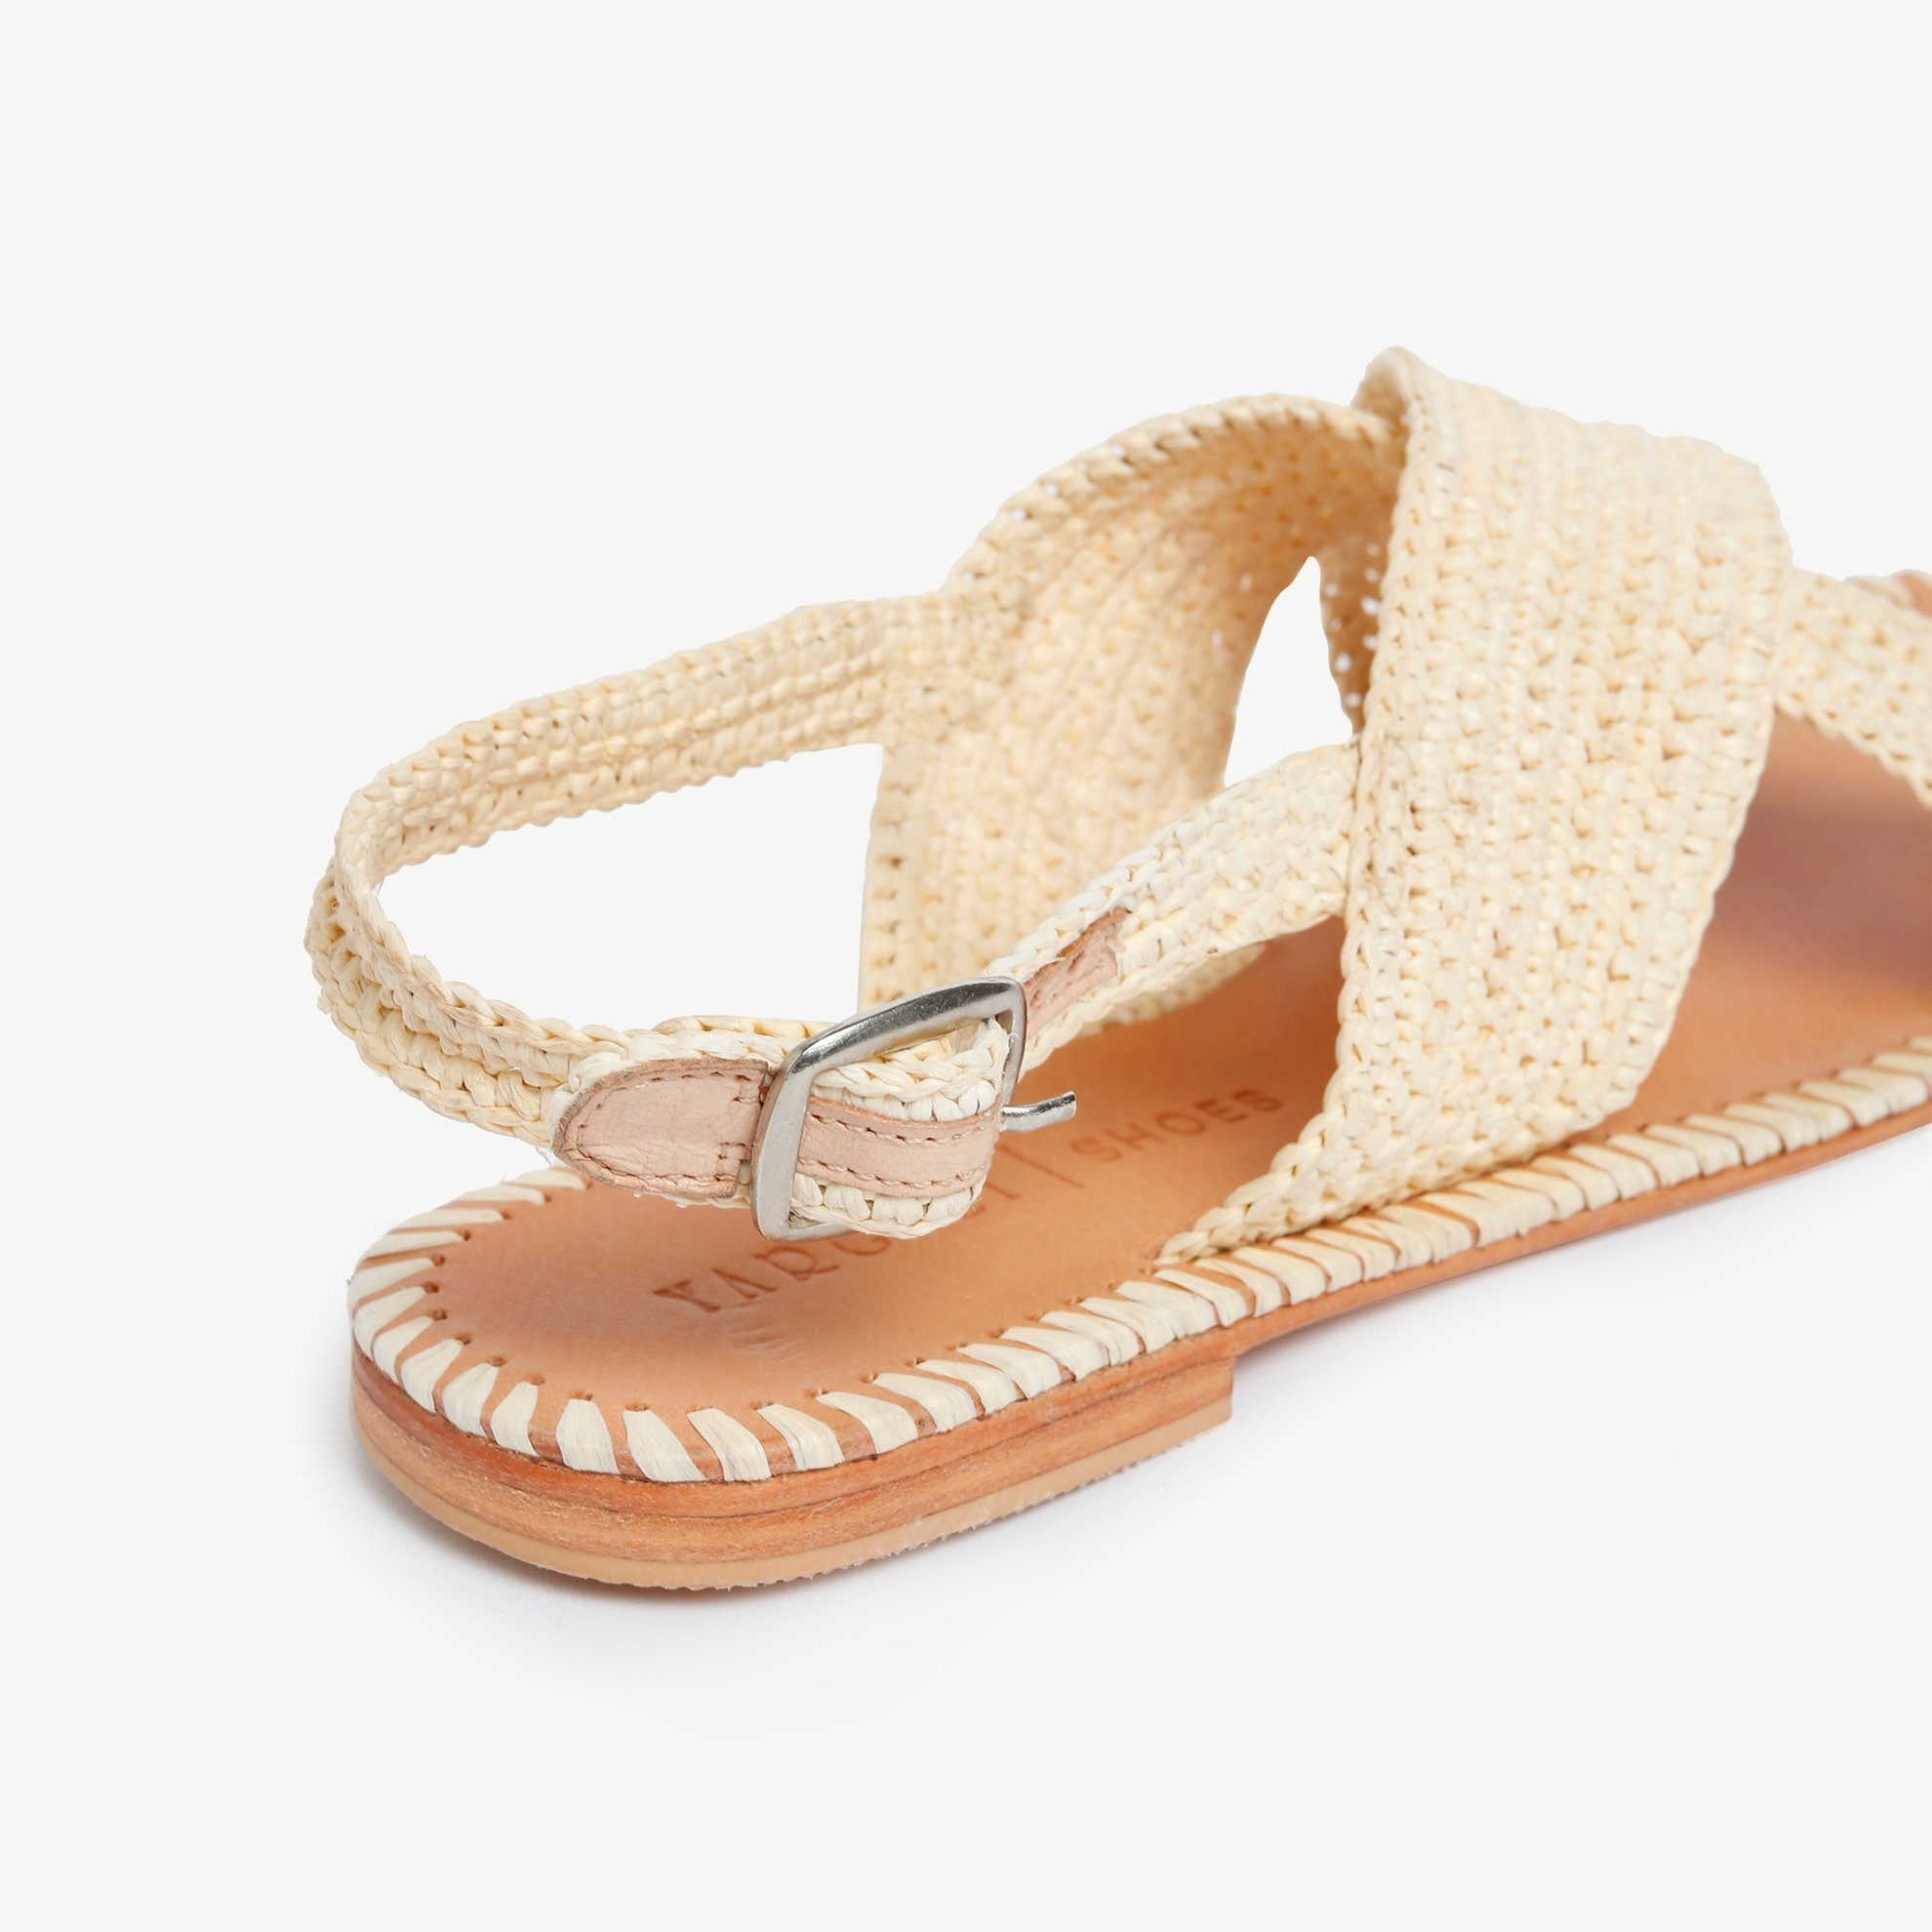 Woven Raffia Sandal